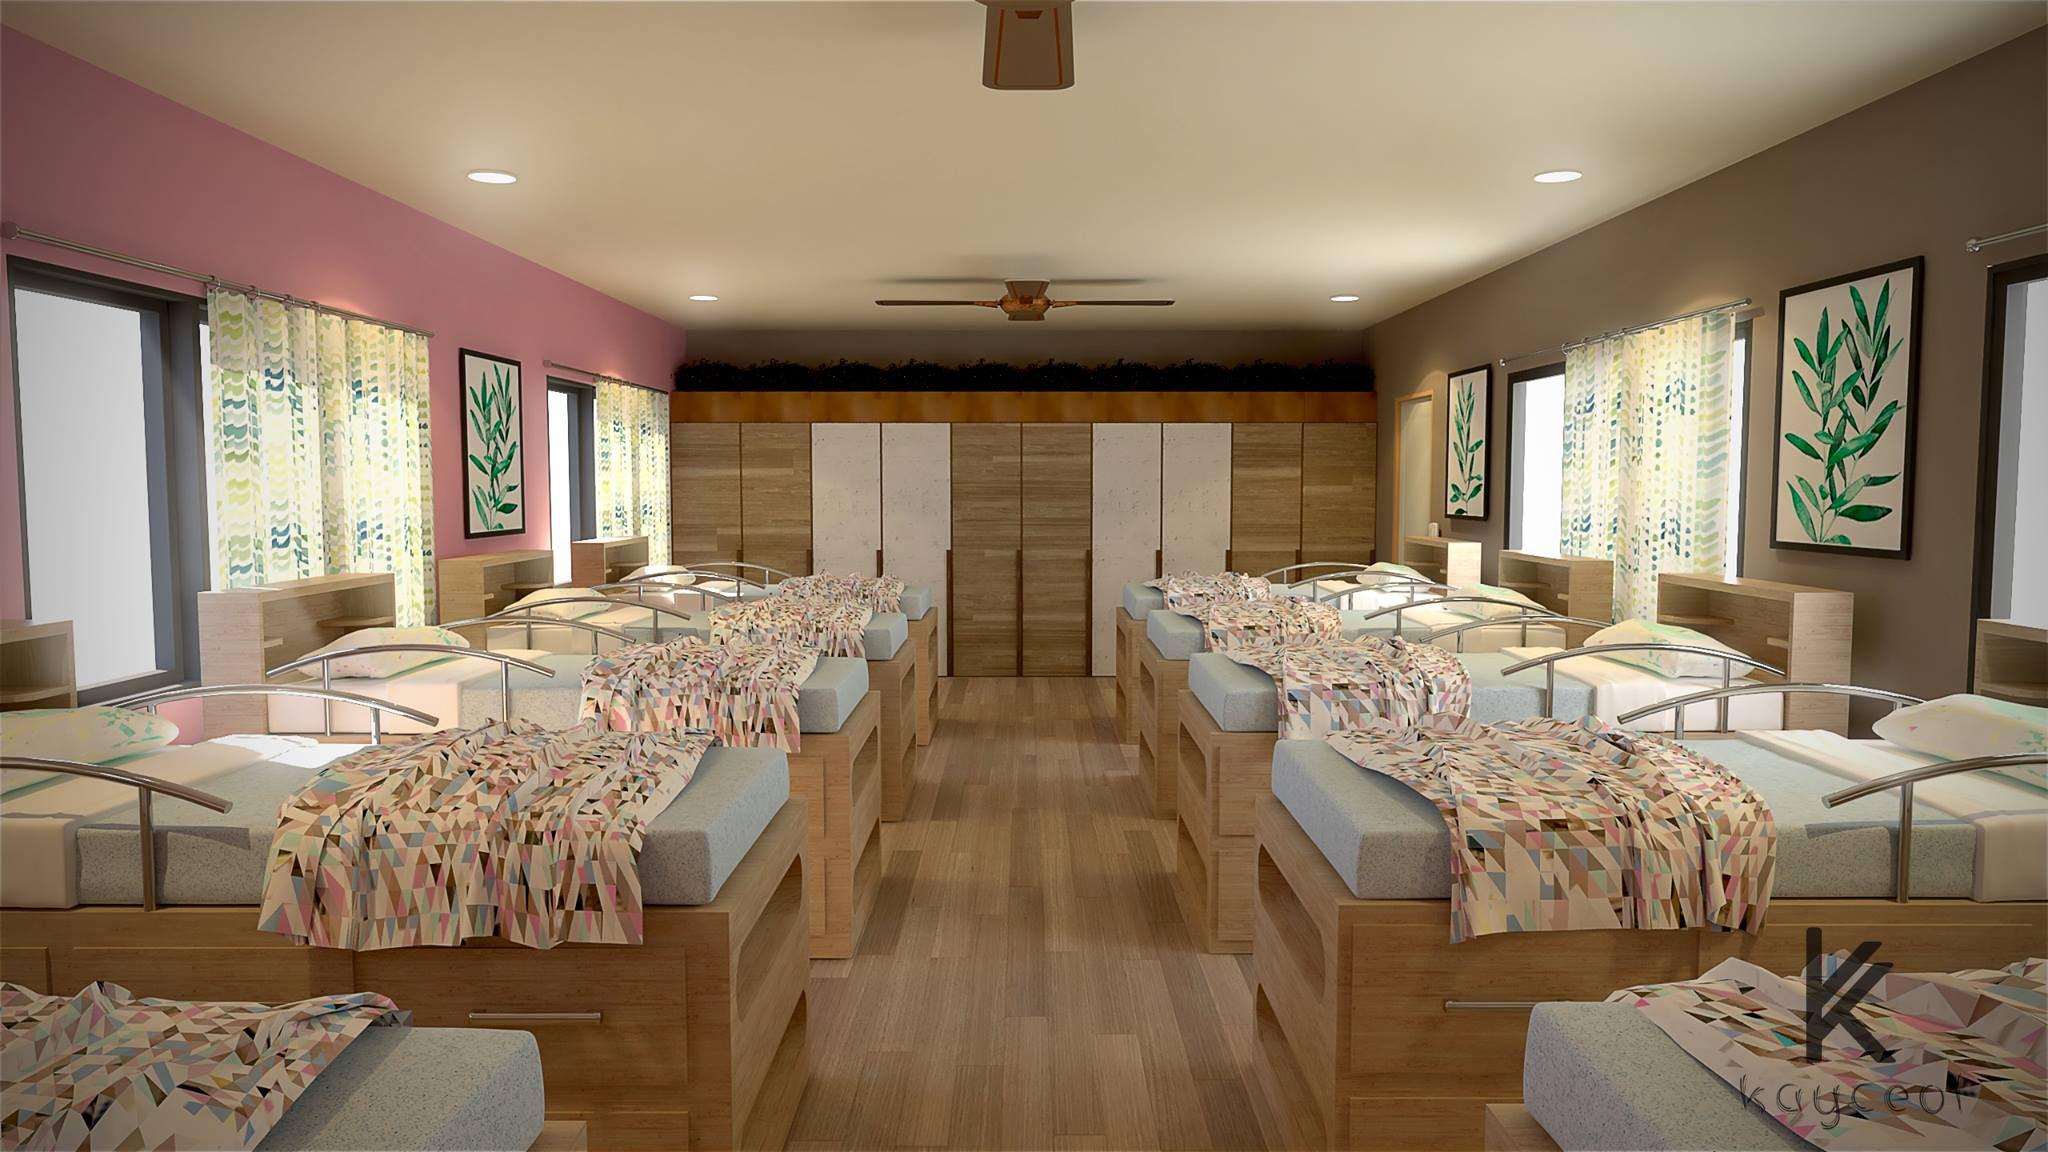 Orphanage Girls Bedroom By Kayceol On Deviantart